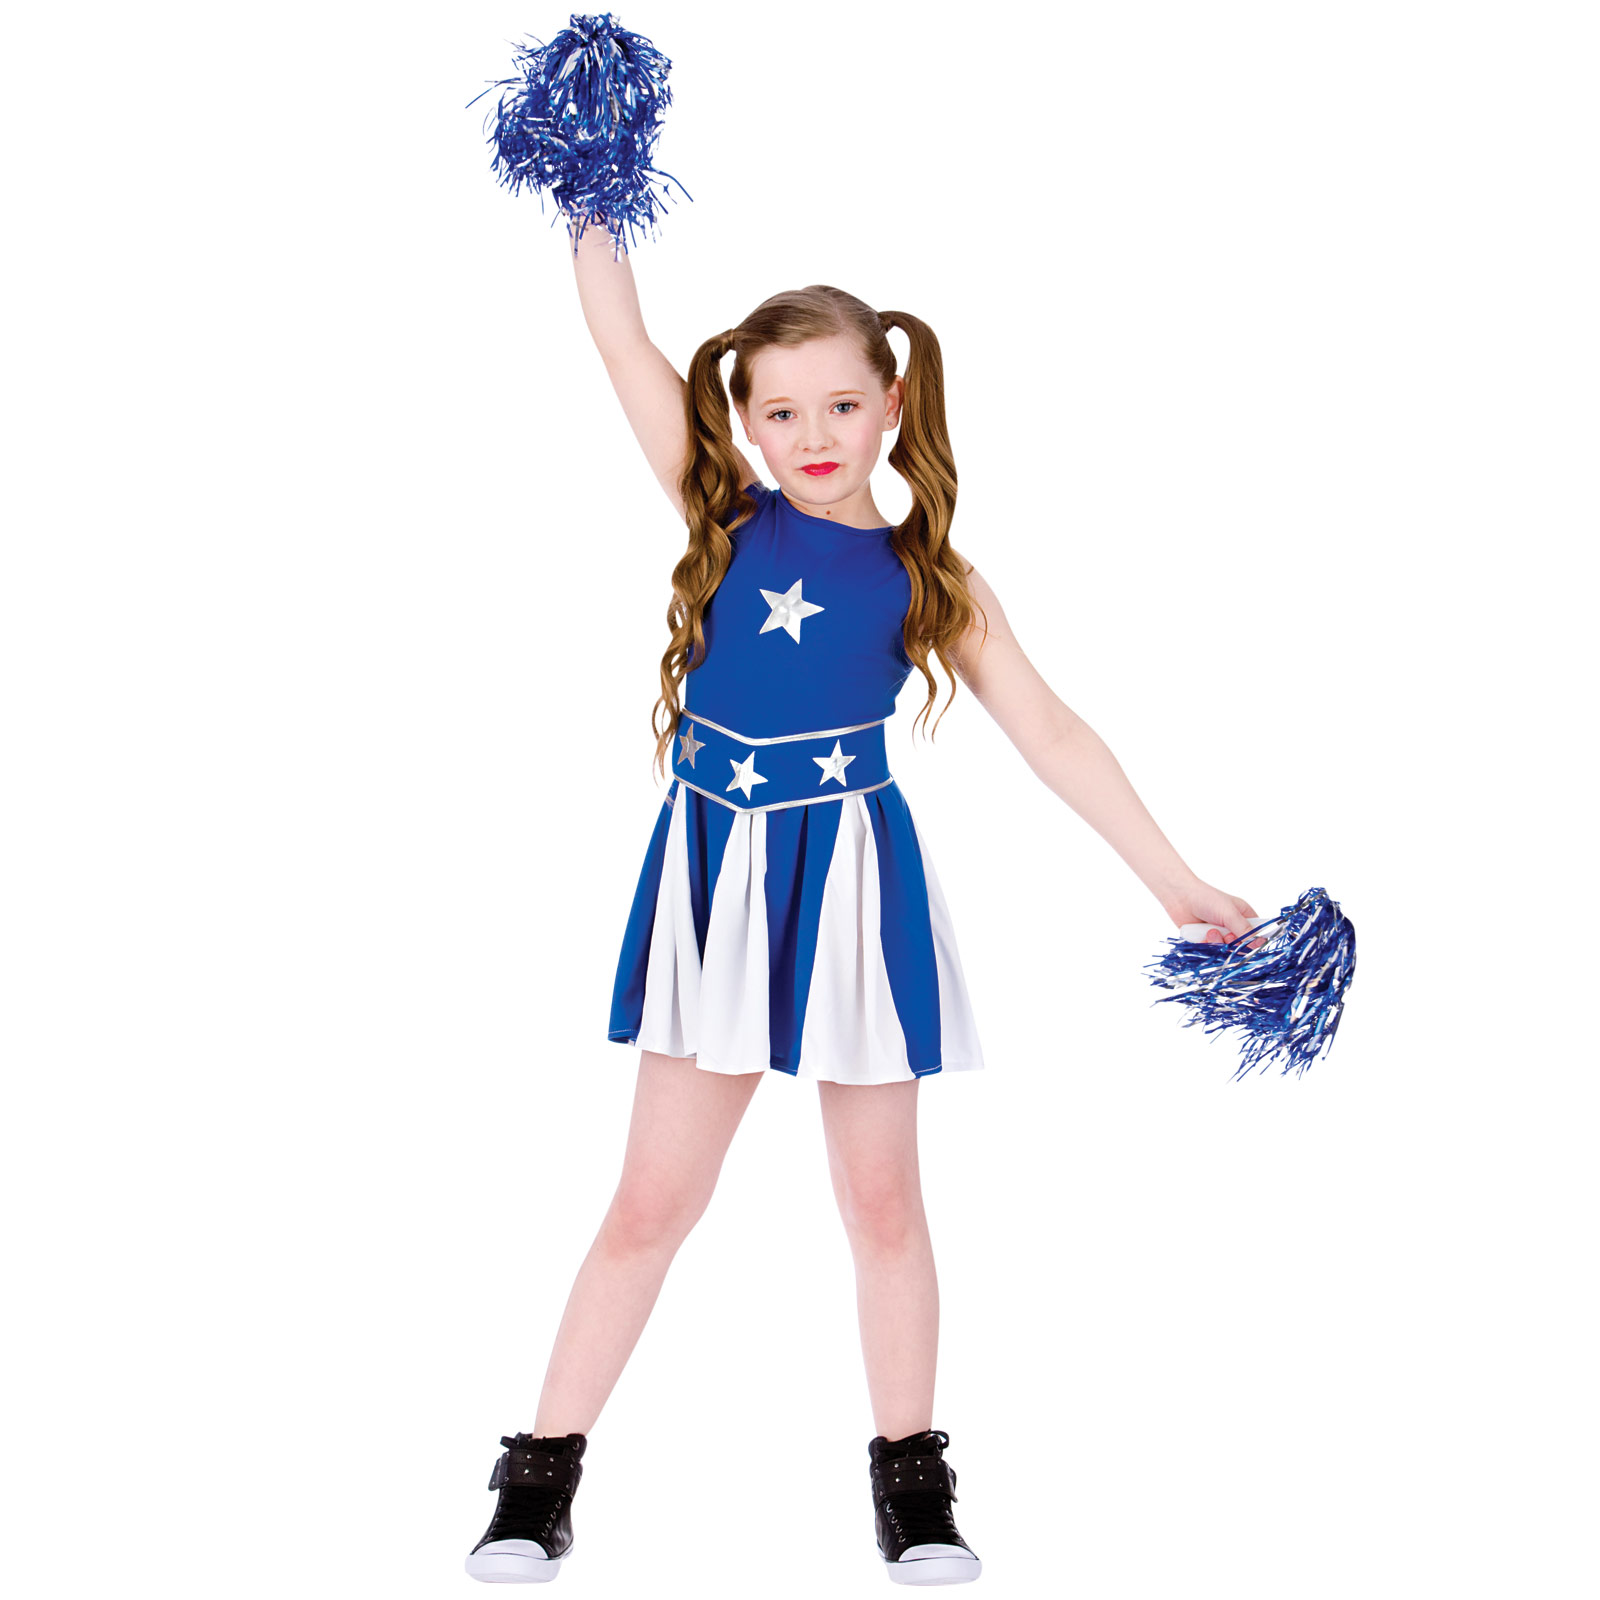 Kids High School Cheerleader Cheer Dress Halloween Costume Outfit ...